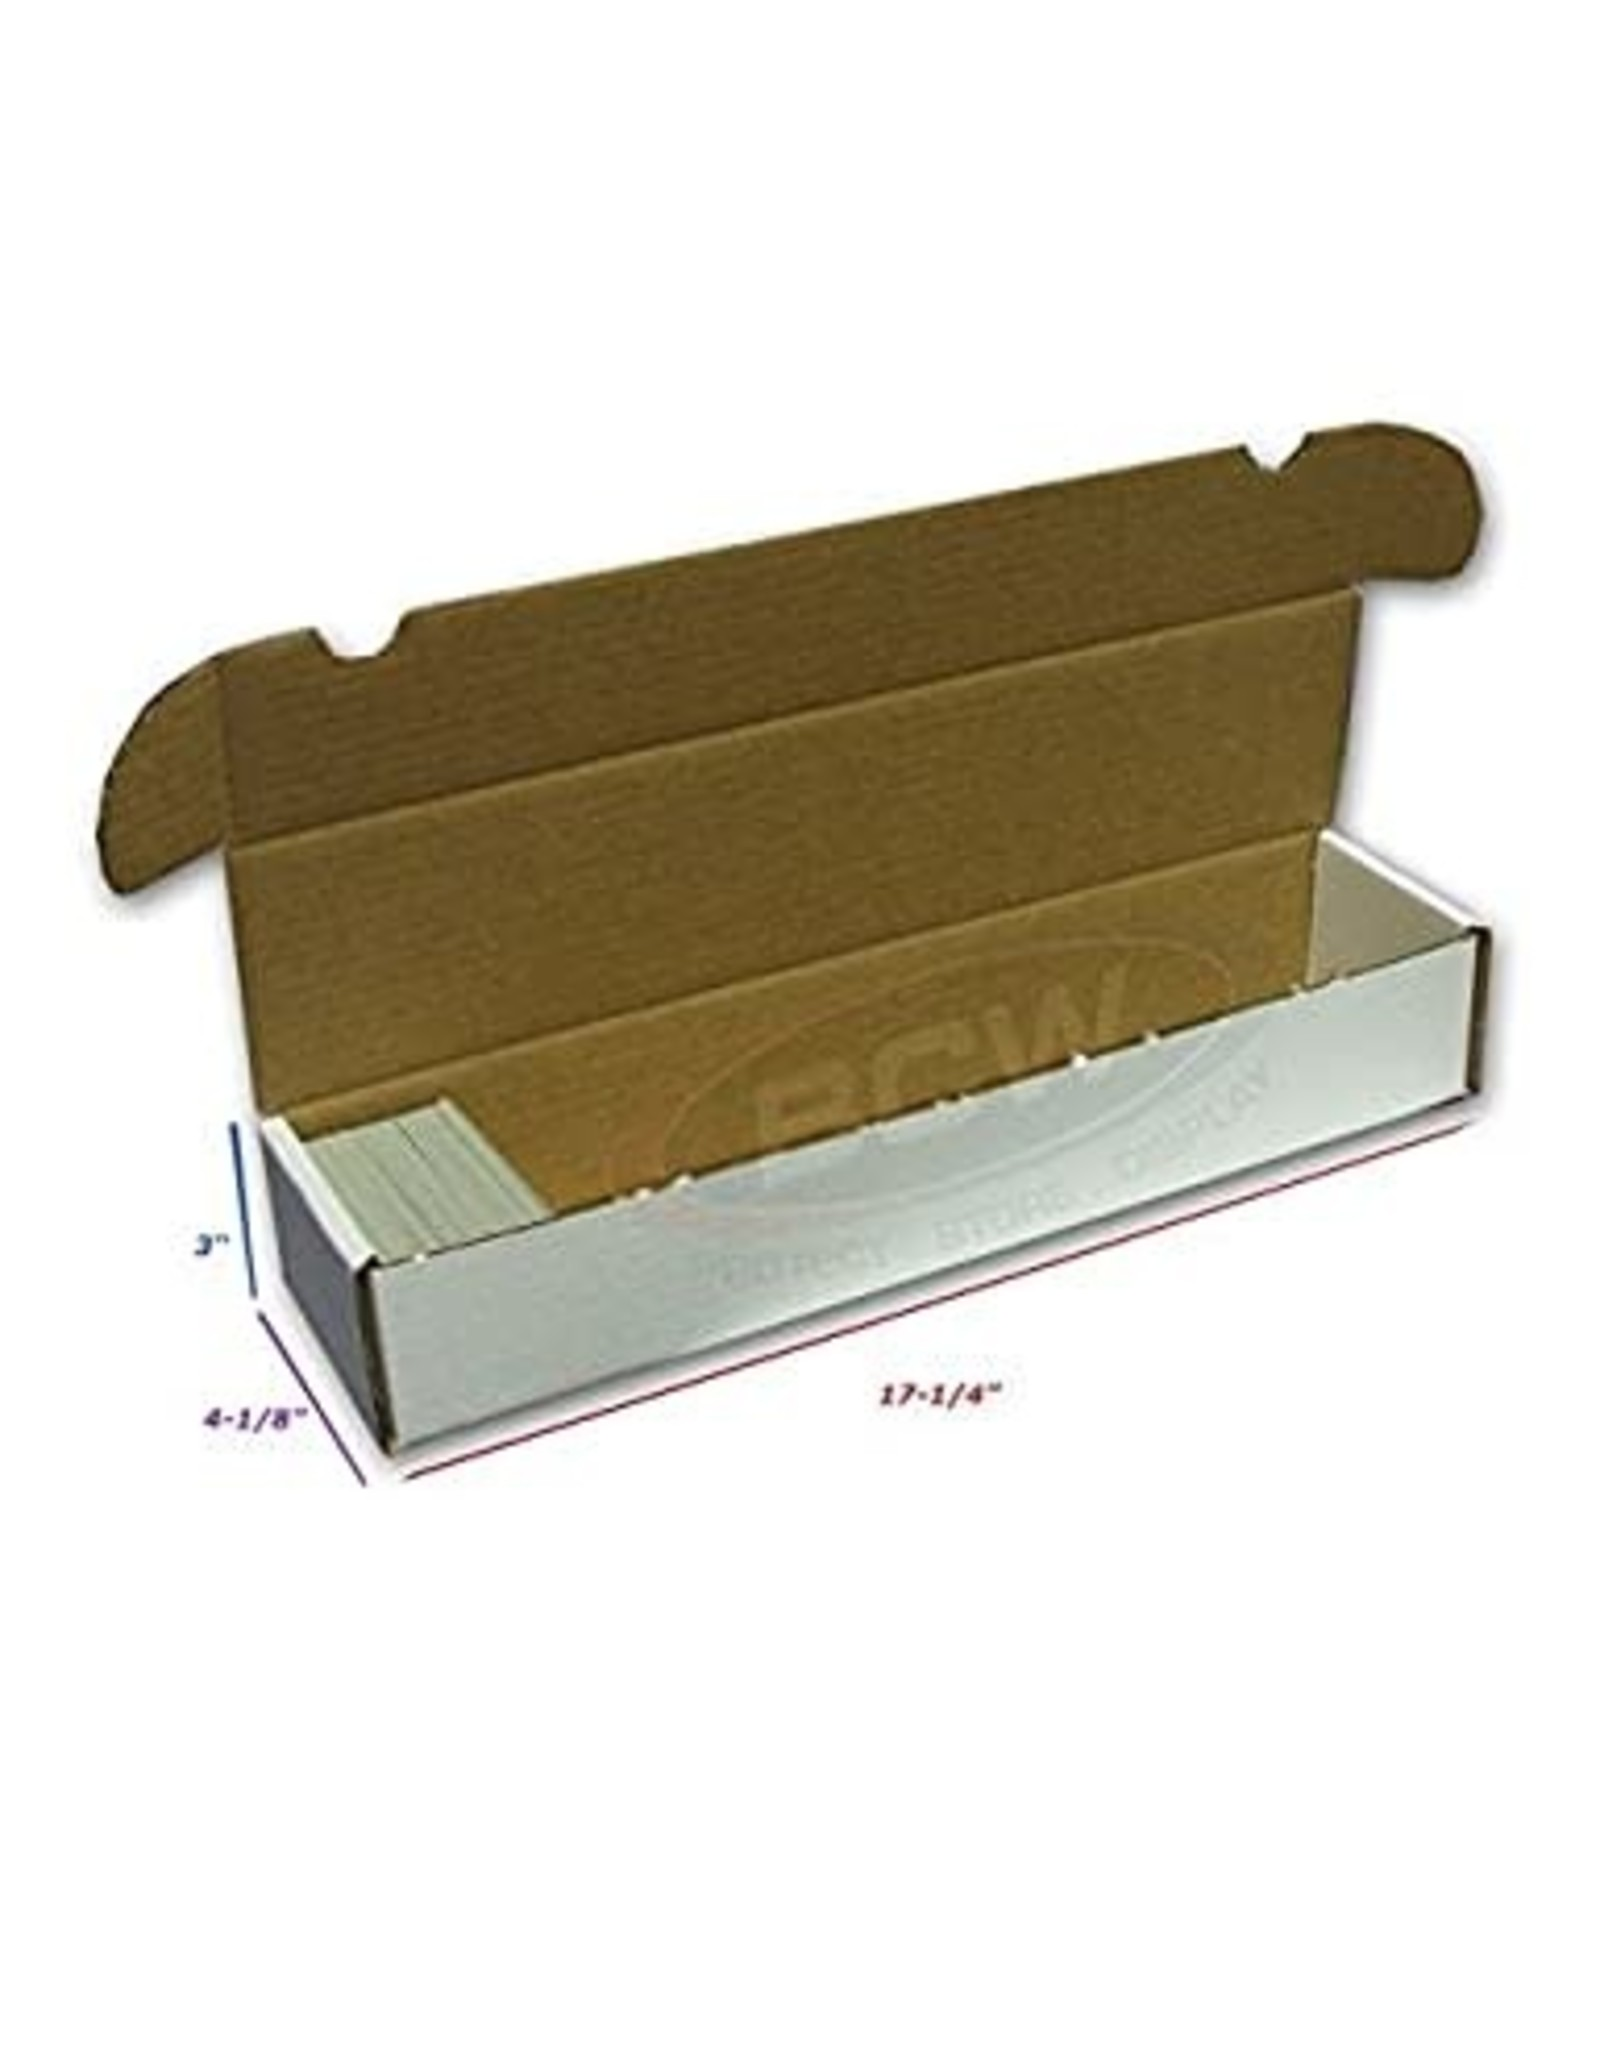 Cardboard Box - 930 Count